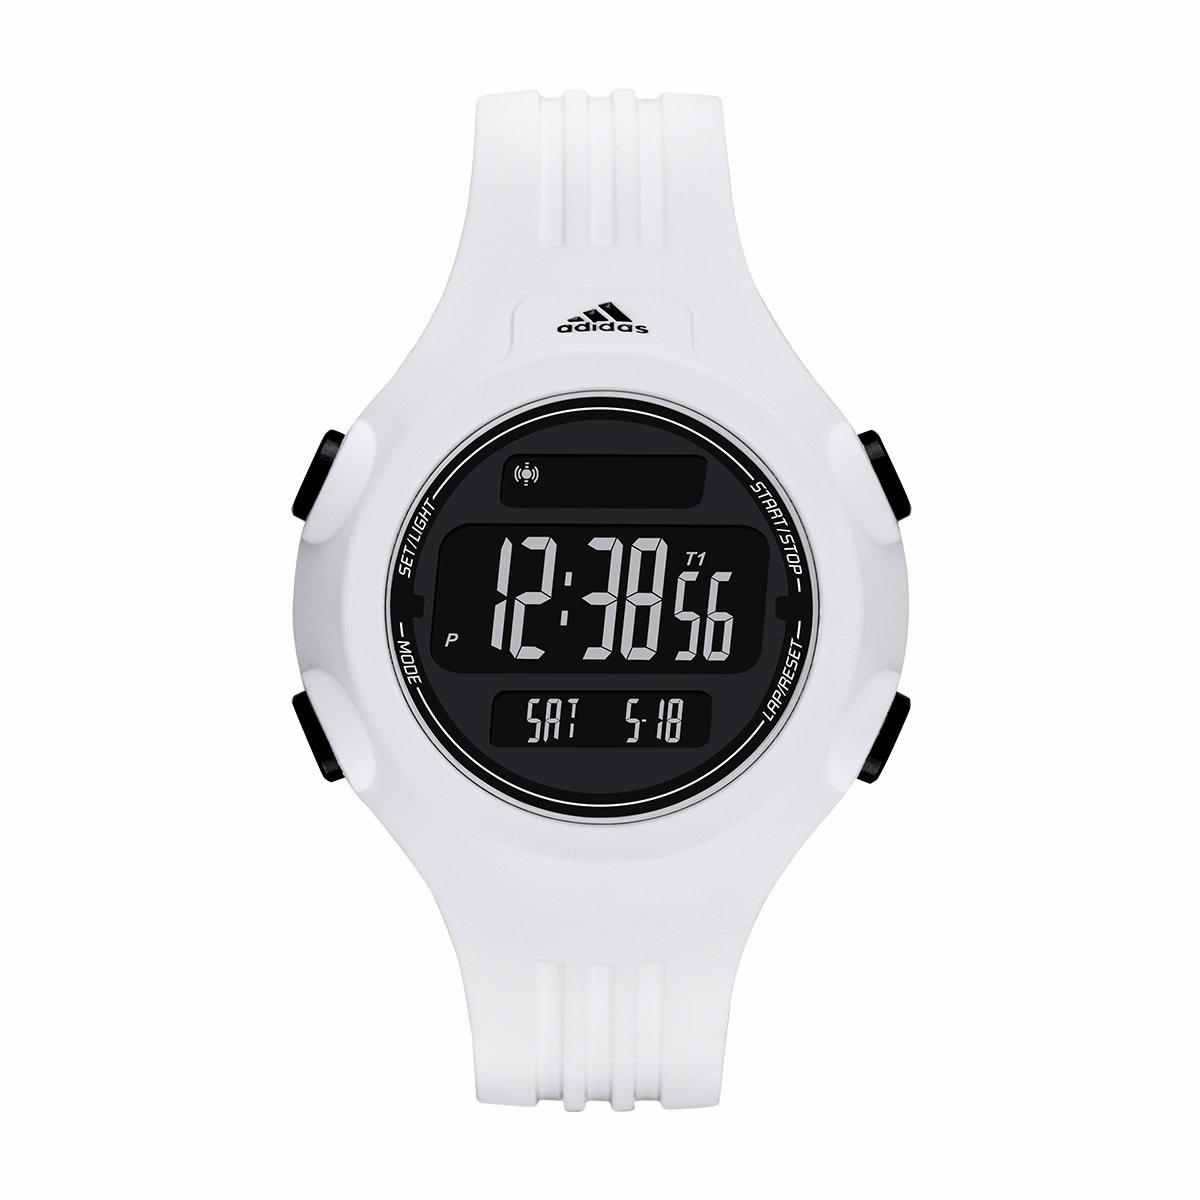 Blanconegro Adp3264 Unisex Questra Adidas Reloj Original jR54AL